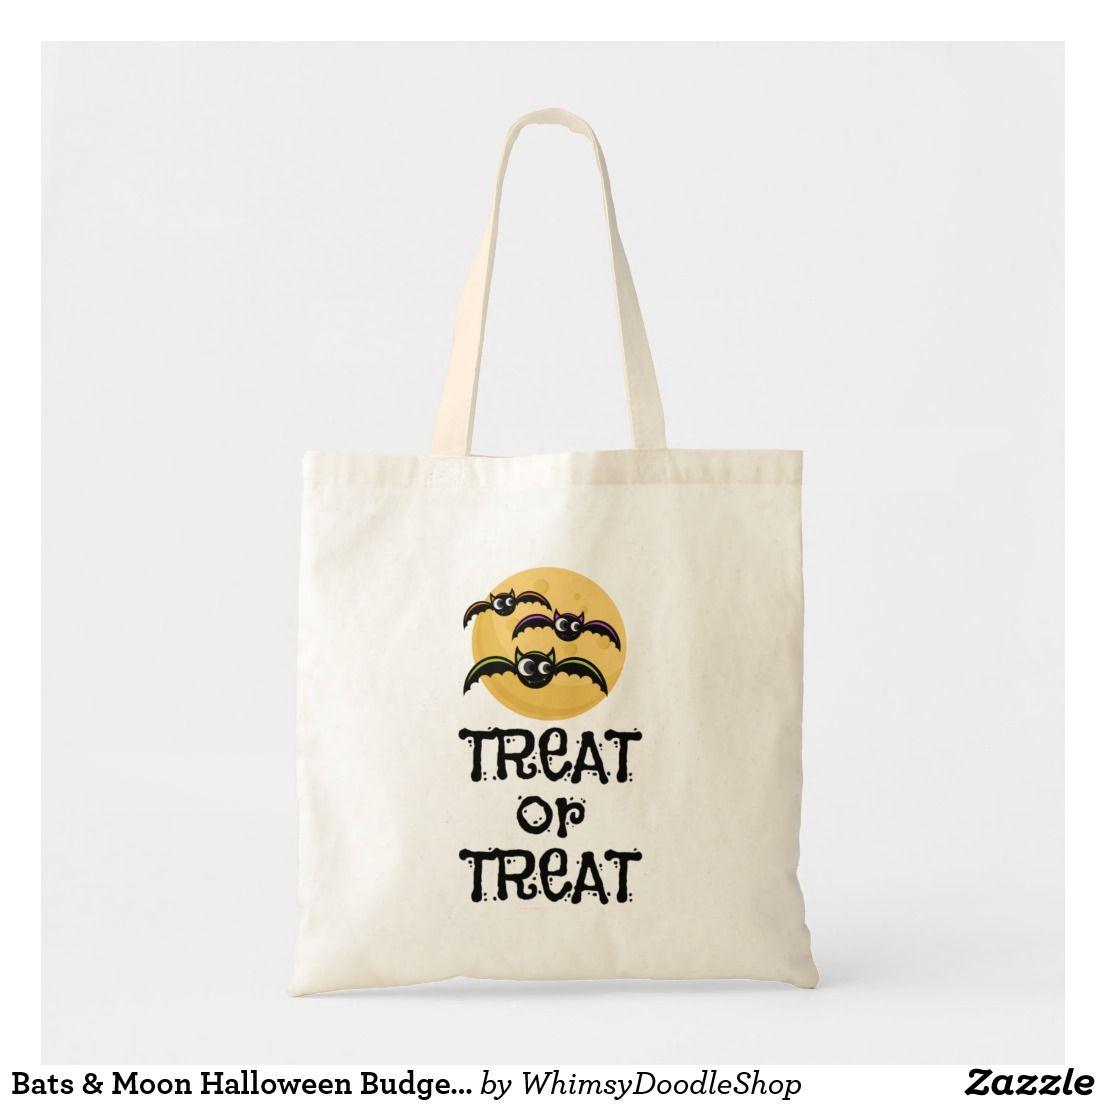 Bats & Moon Halloween Budget Tote Halloween tote bag